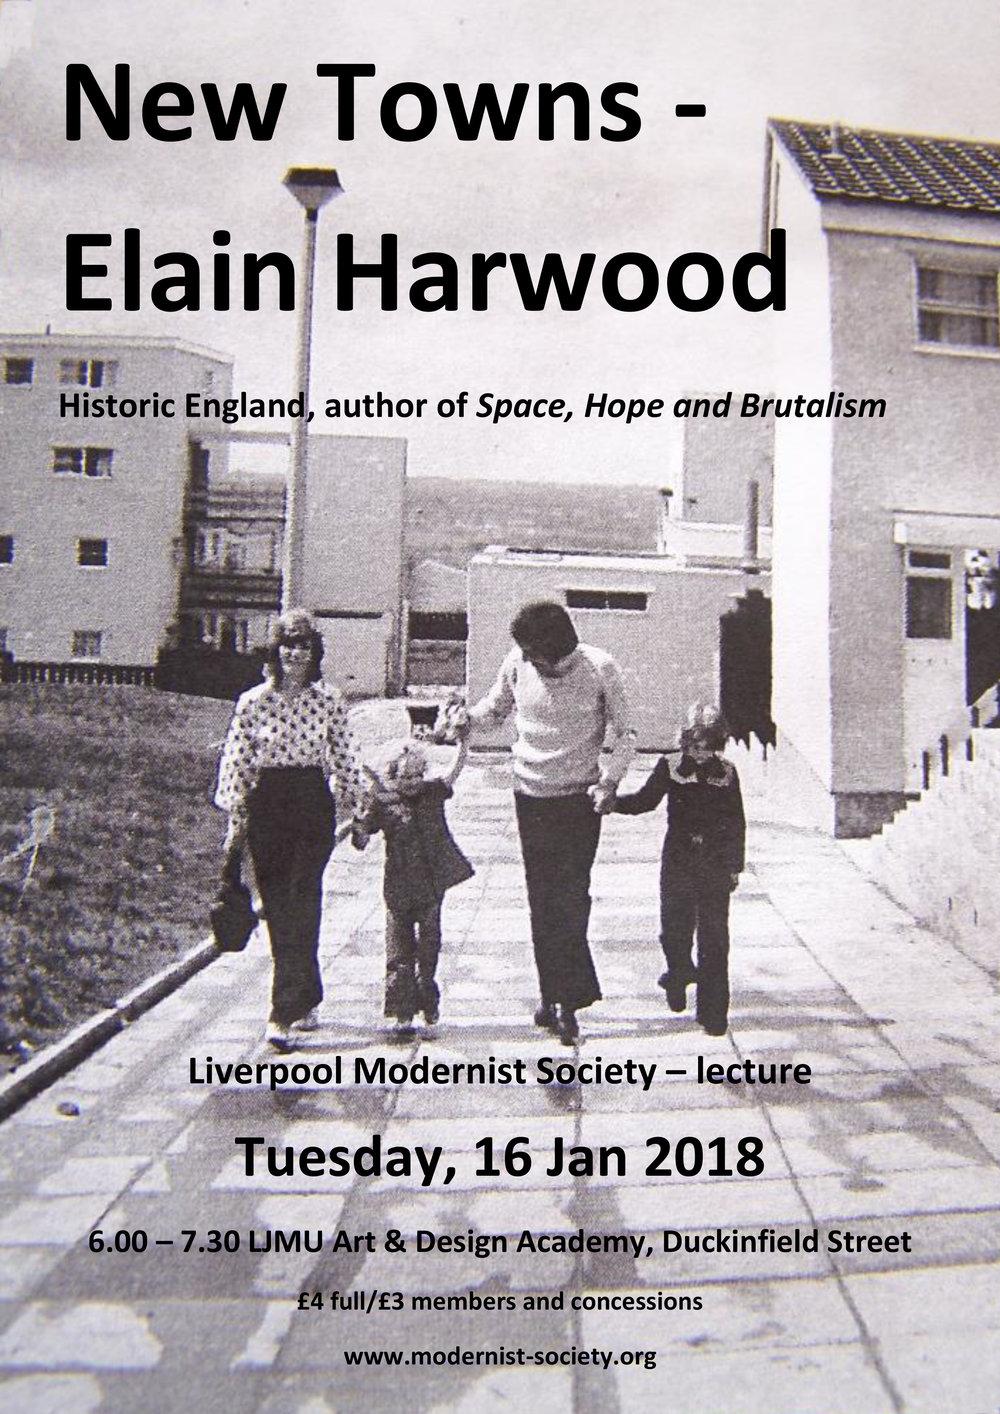 Elain Harwood poster 2a.jpg